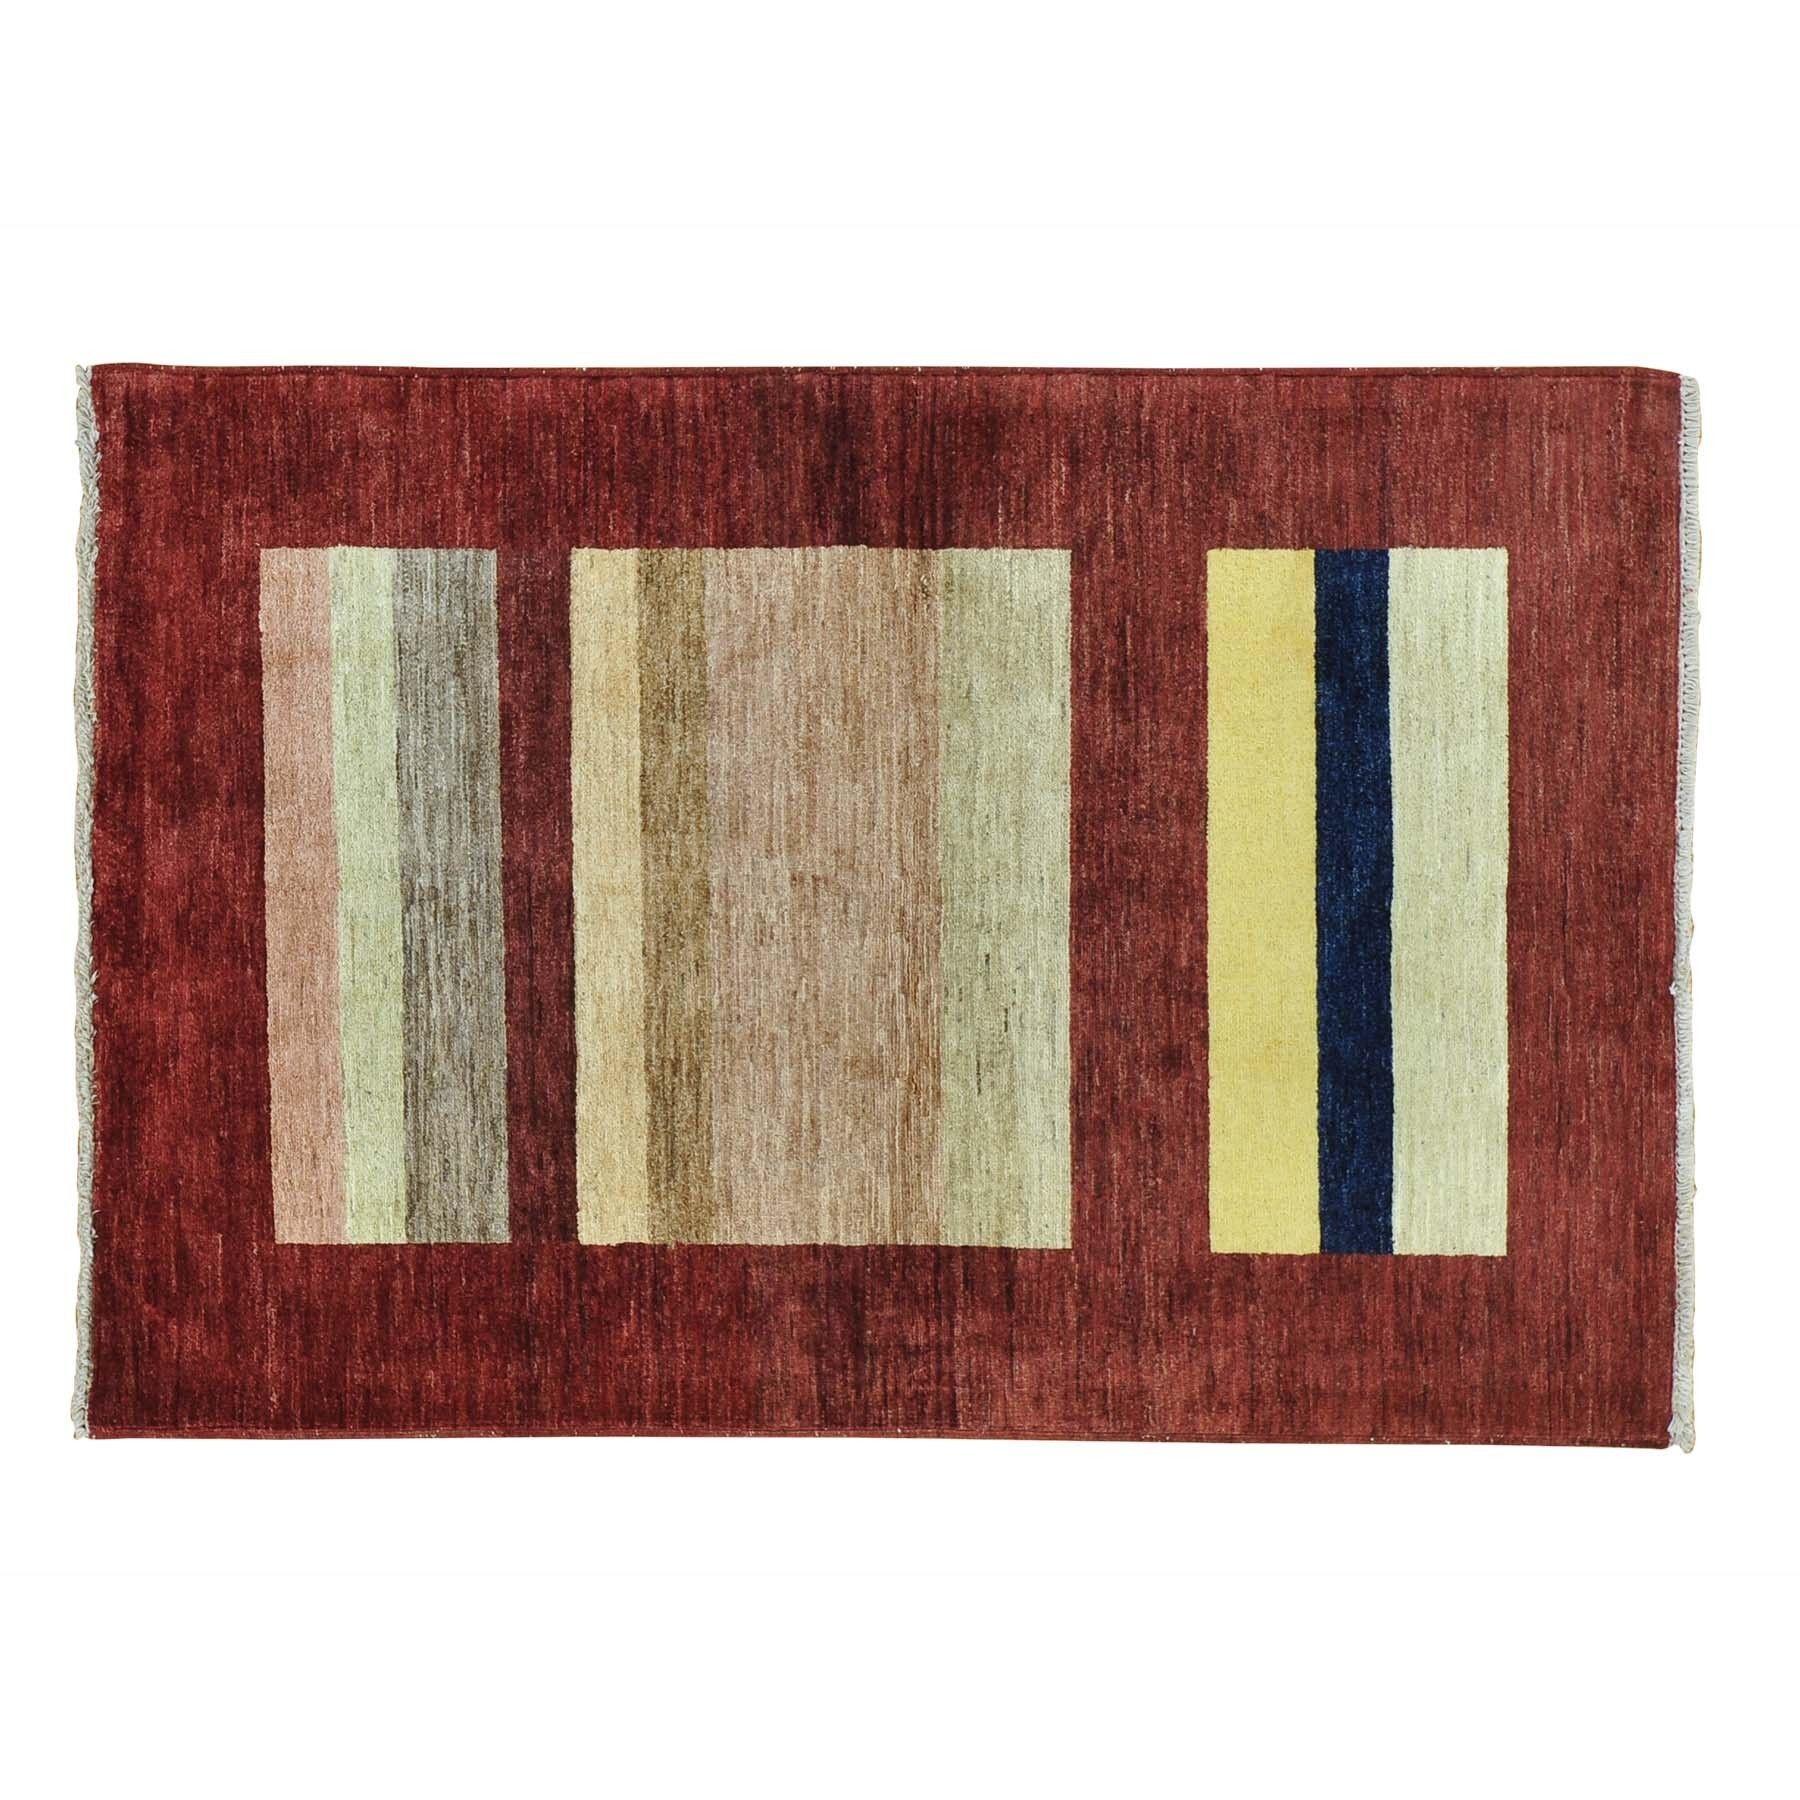 "1800getarug Peshawar Gabbeh Wool Handmade Oriental Rug (4' x 5'10) (Exact Size: 4'0"" x 5'10""), Multi, Size 4' x 6'"